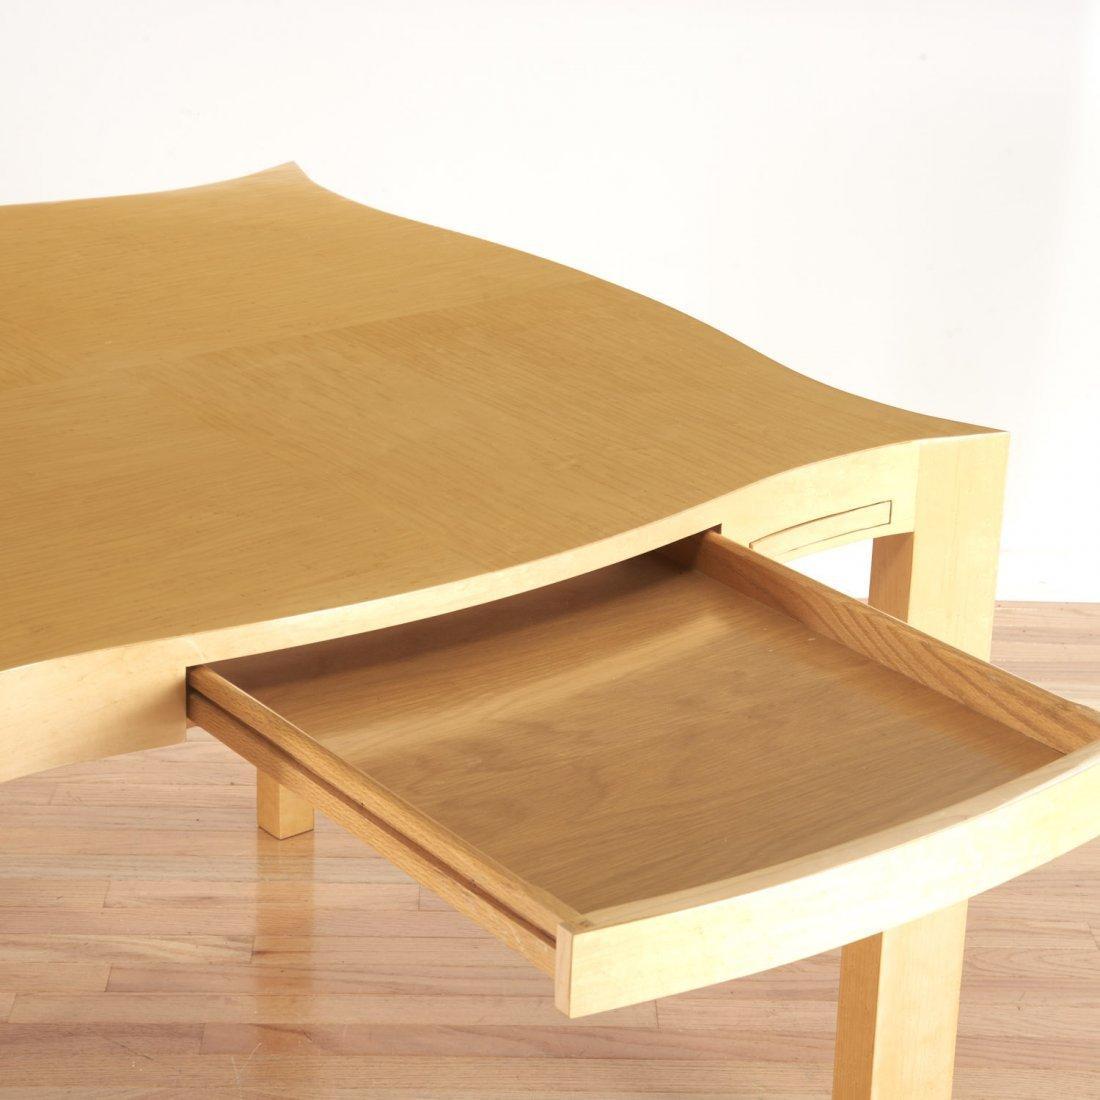 Designer shaped blonde wood bridge table - 3